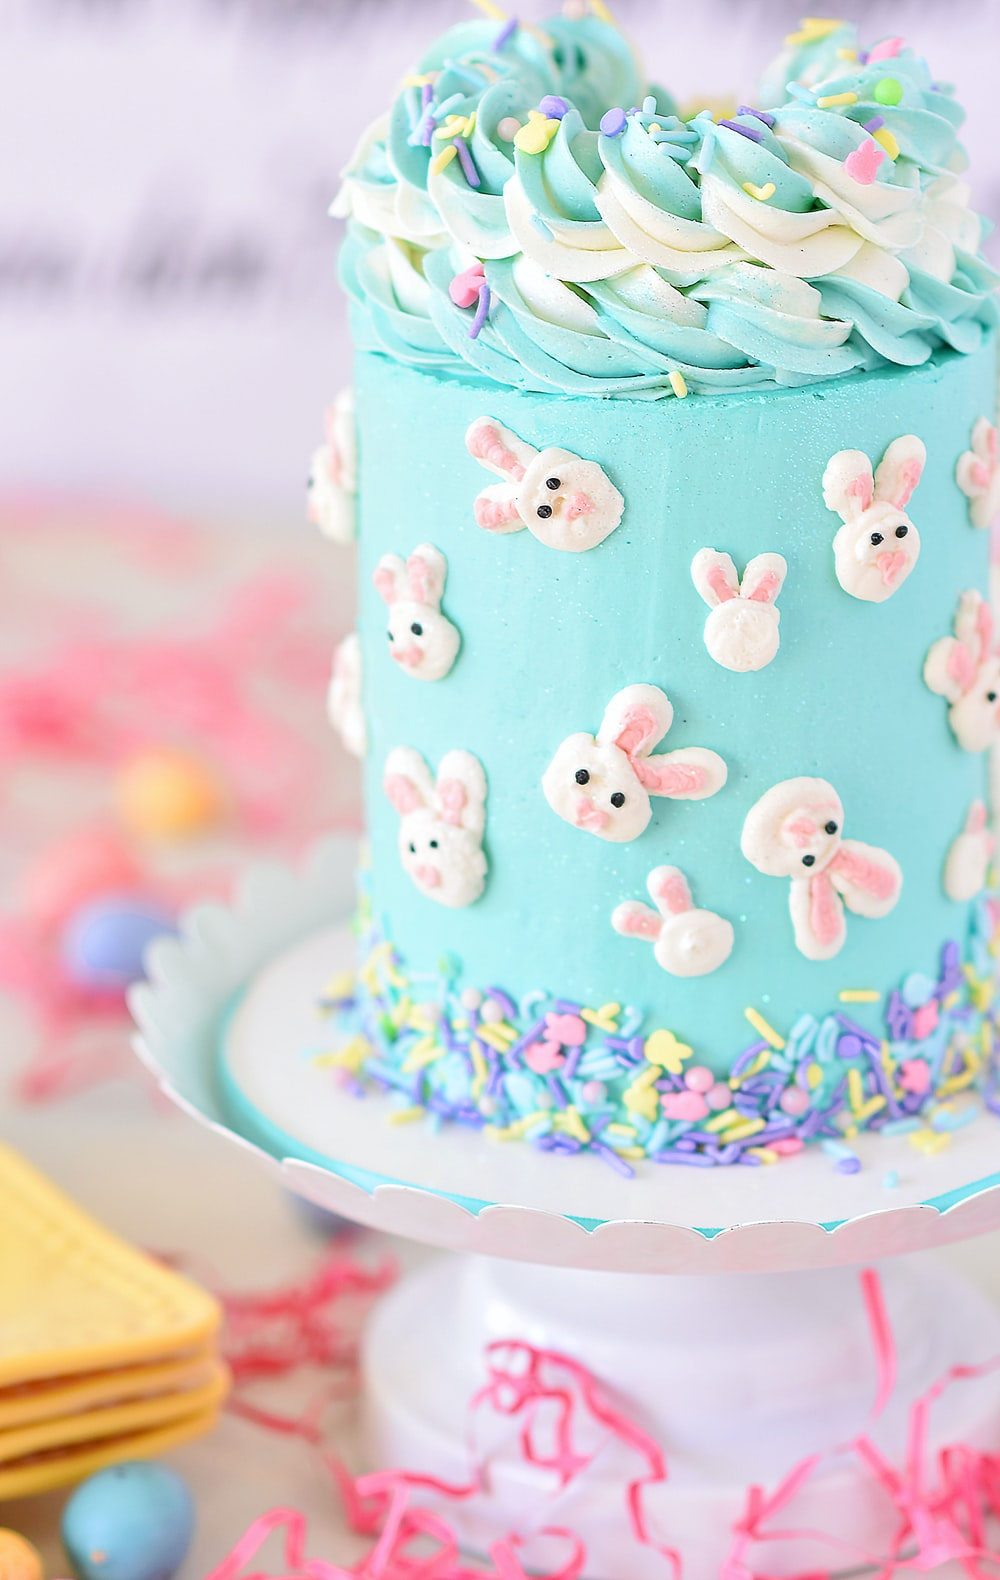 blue and white polka dot cupcake